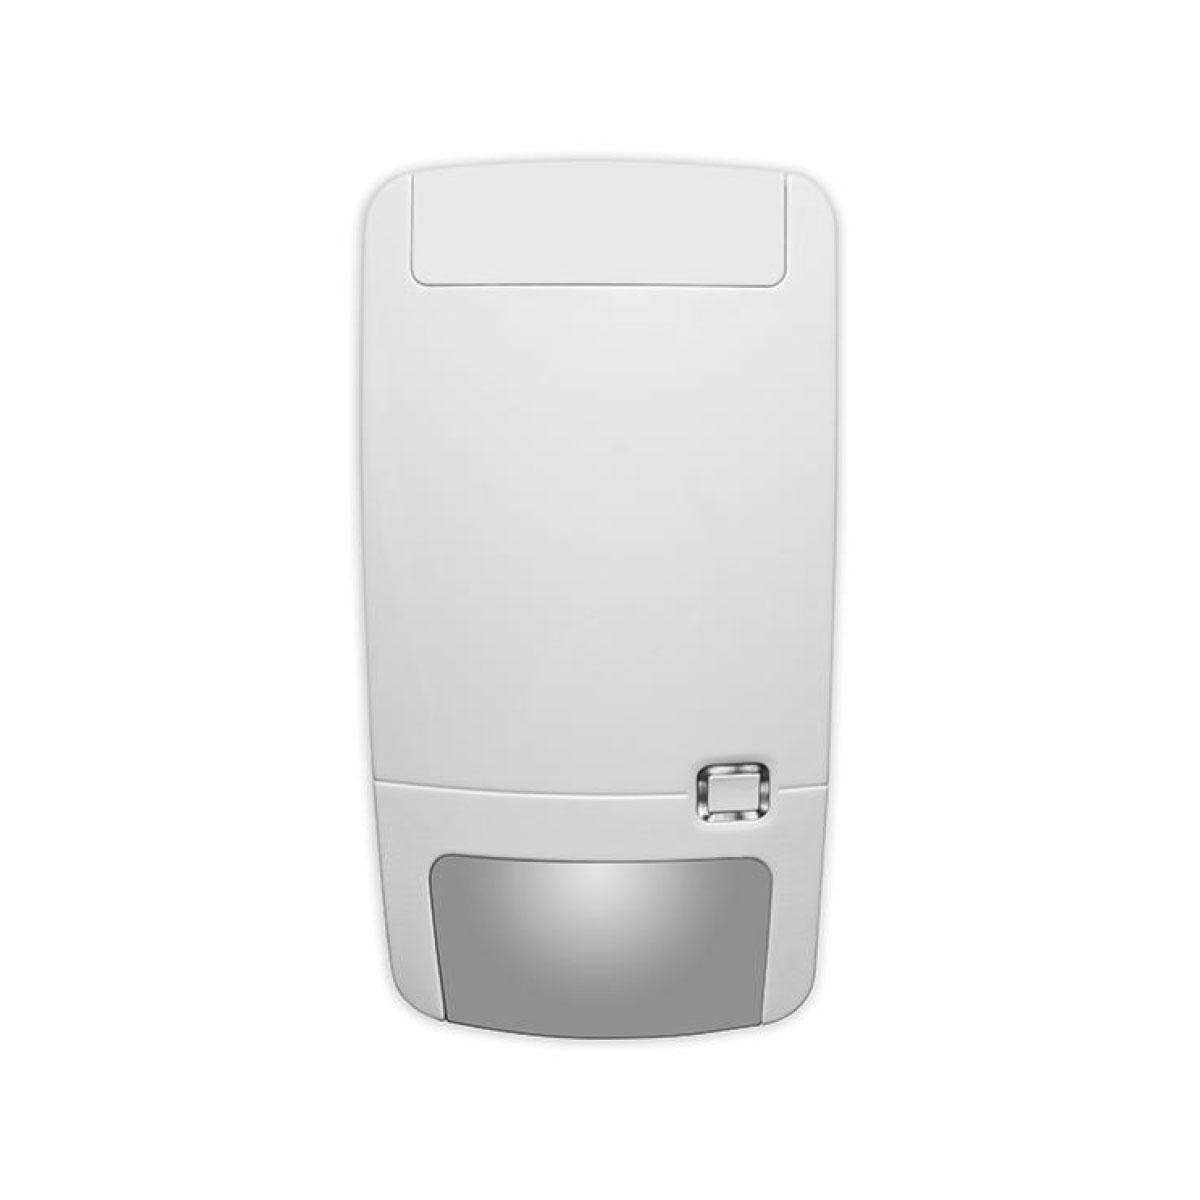 Volumetrico wireless